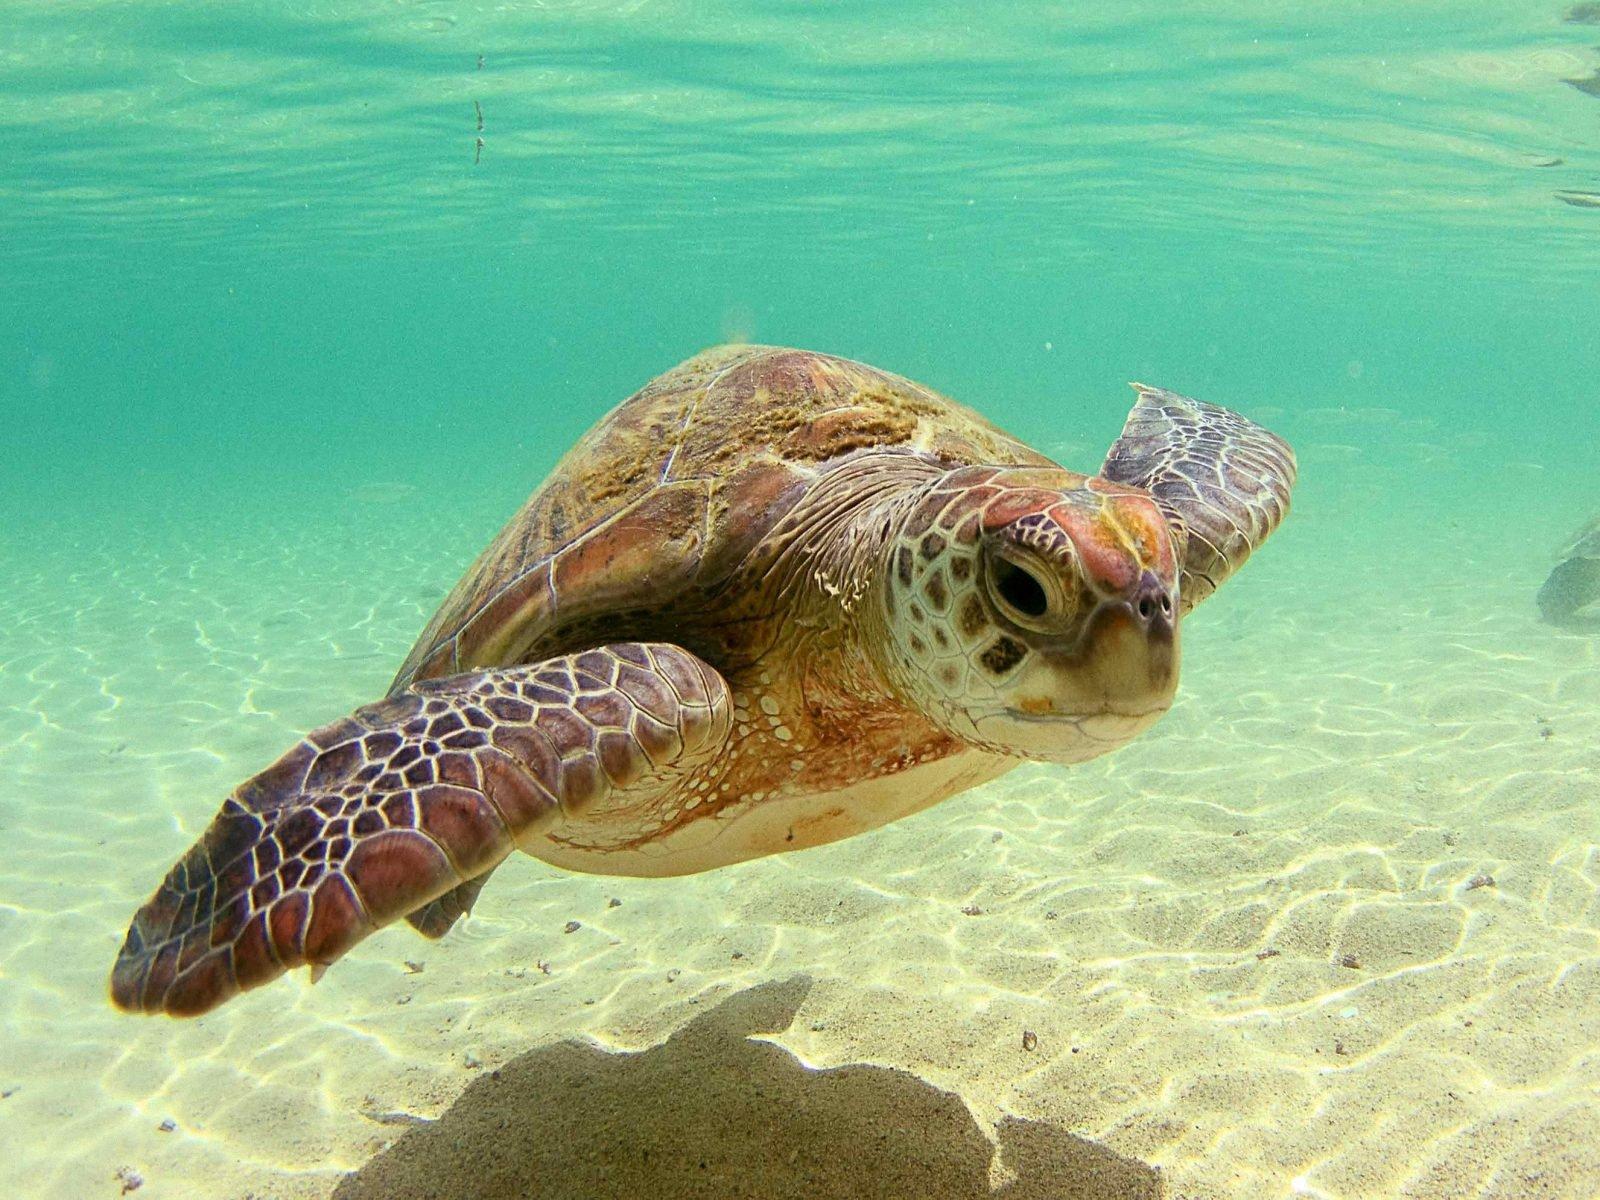 [48+] Free Sea Turtle Wallpaper Backgrounds on WallpaperSafari